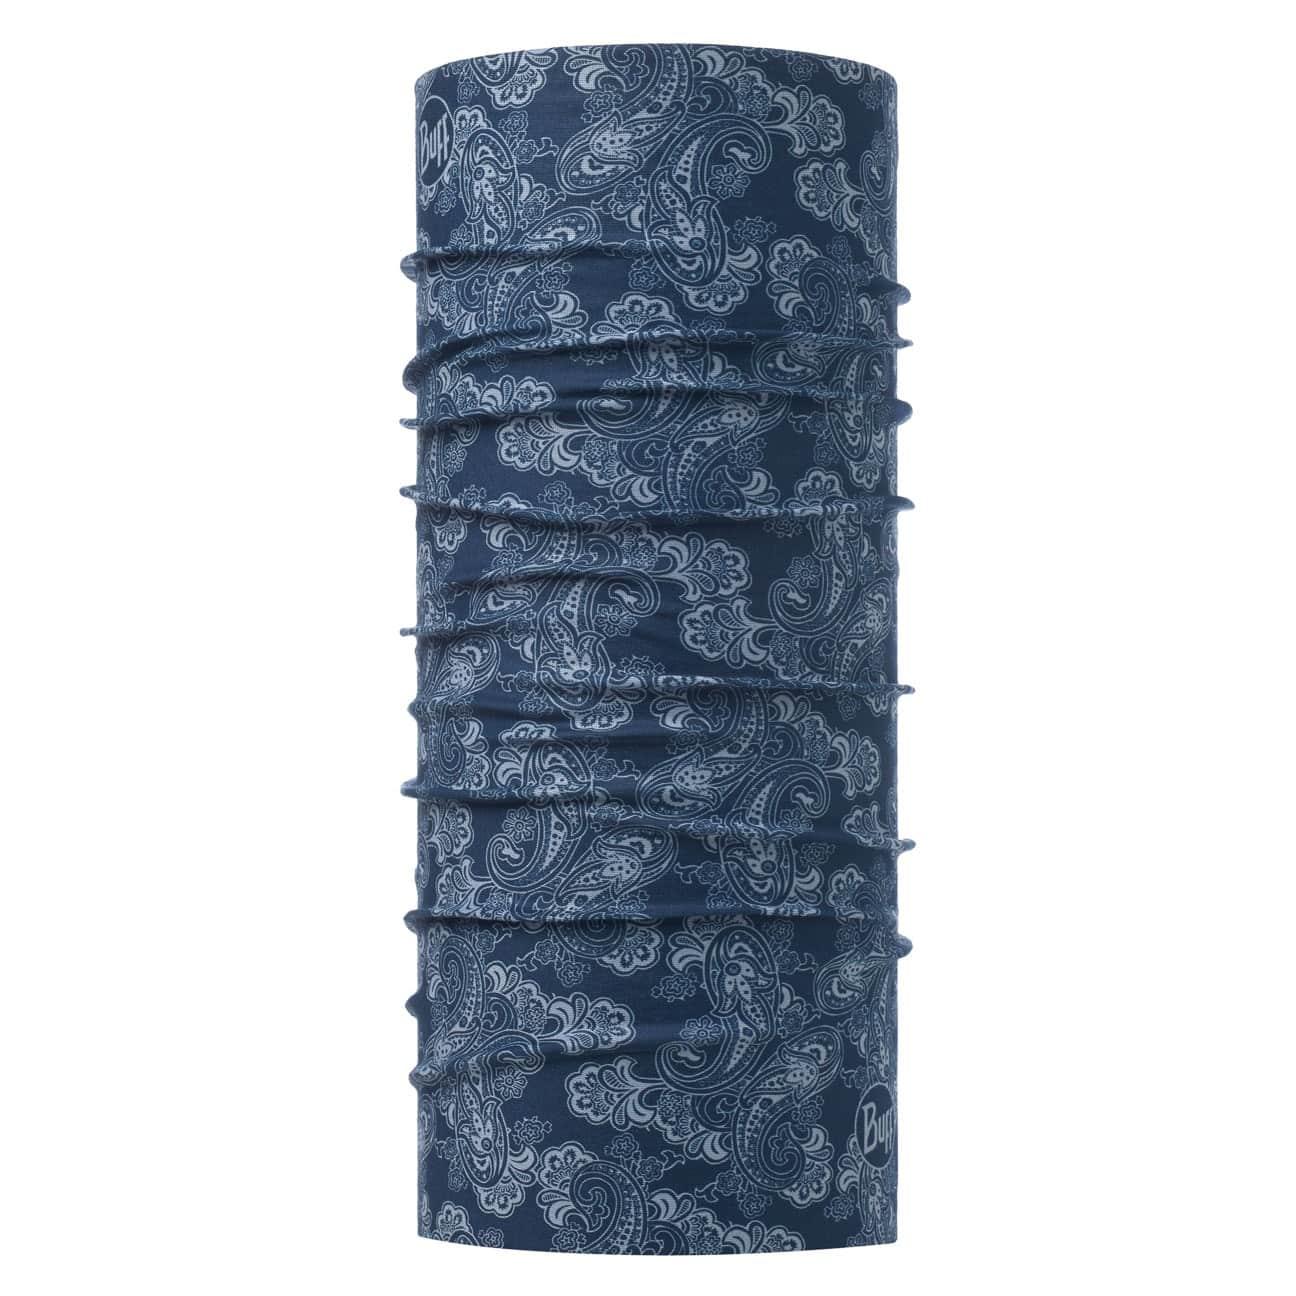 Bandana Multifuncional Blue Jacquard by BUFF  cinta para la cabeza